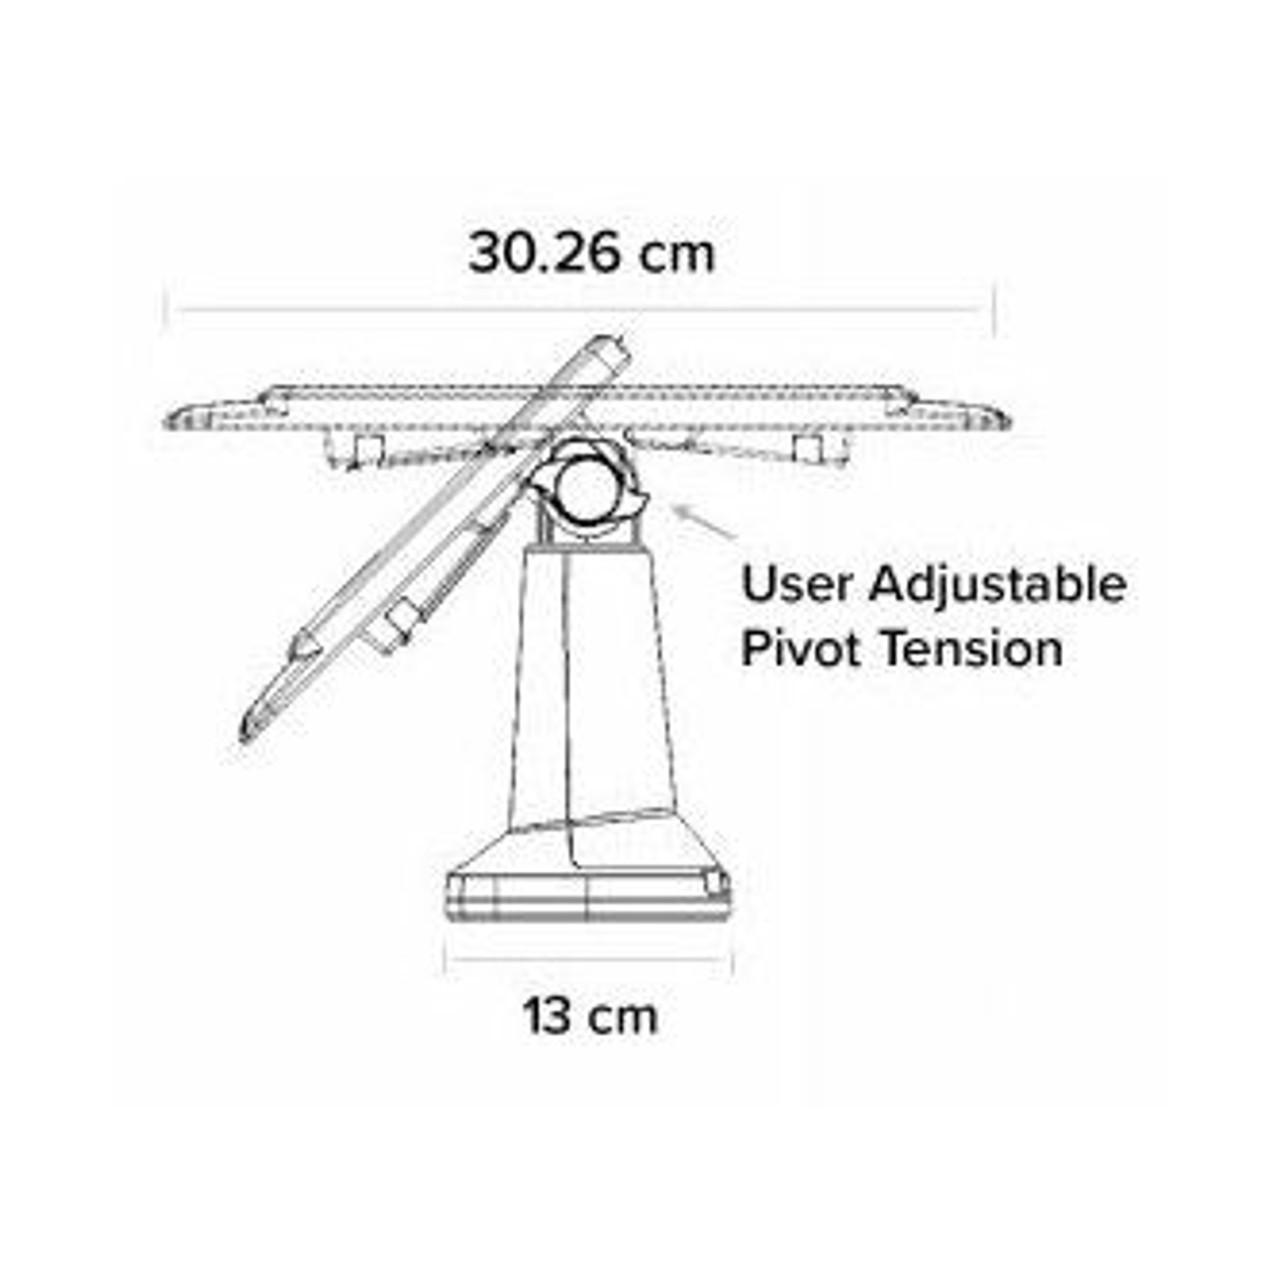 Verifone P200 P400 Tailwind FlexiPole Plus Stand